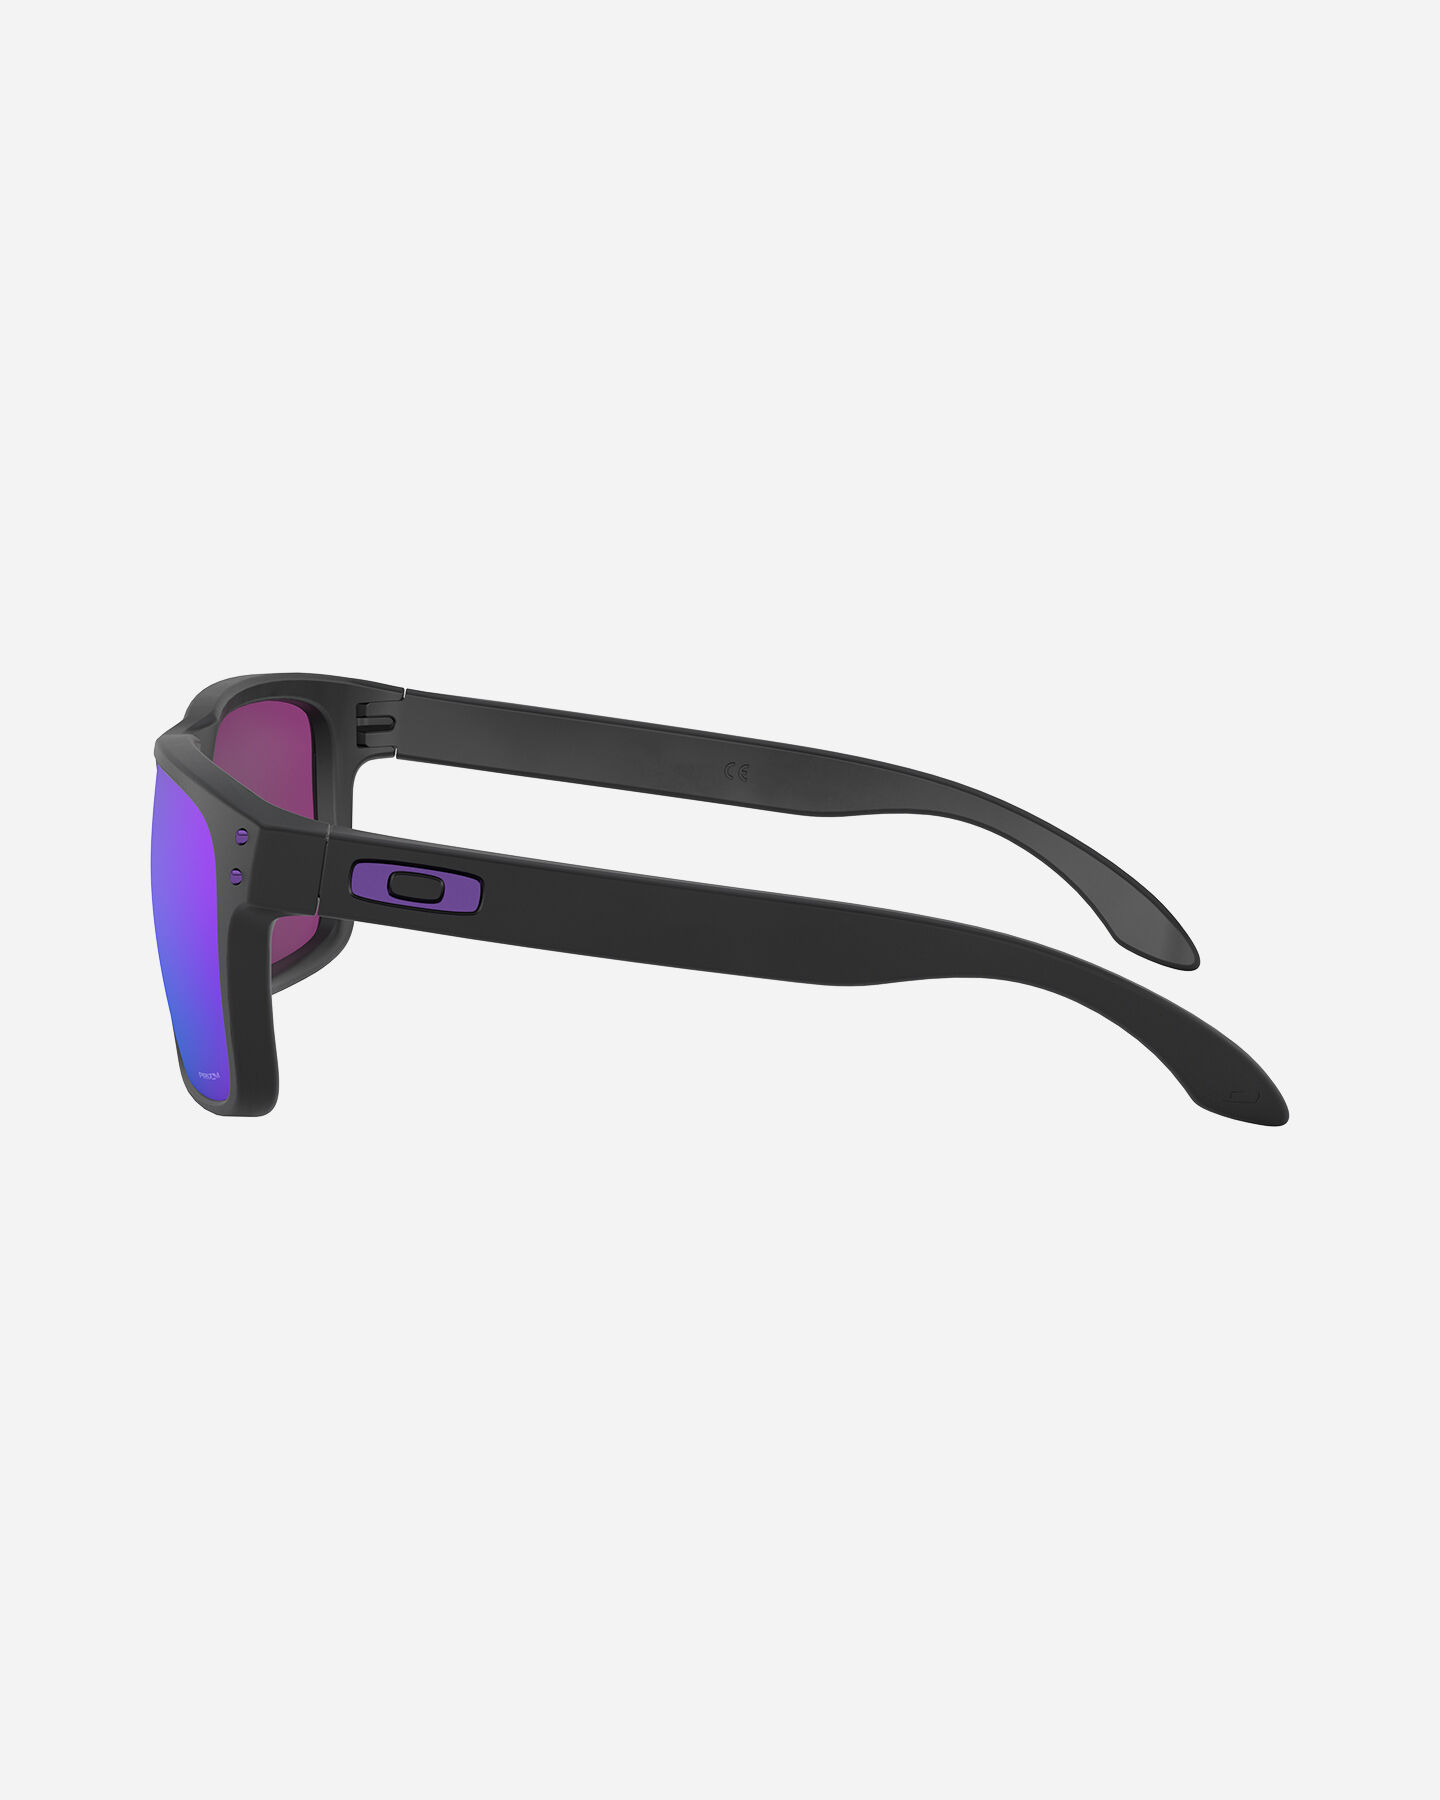 Occhiali OAKLEY HOLBROOK M S5262394|K655|55 scatto 3